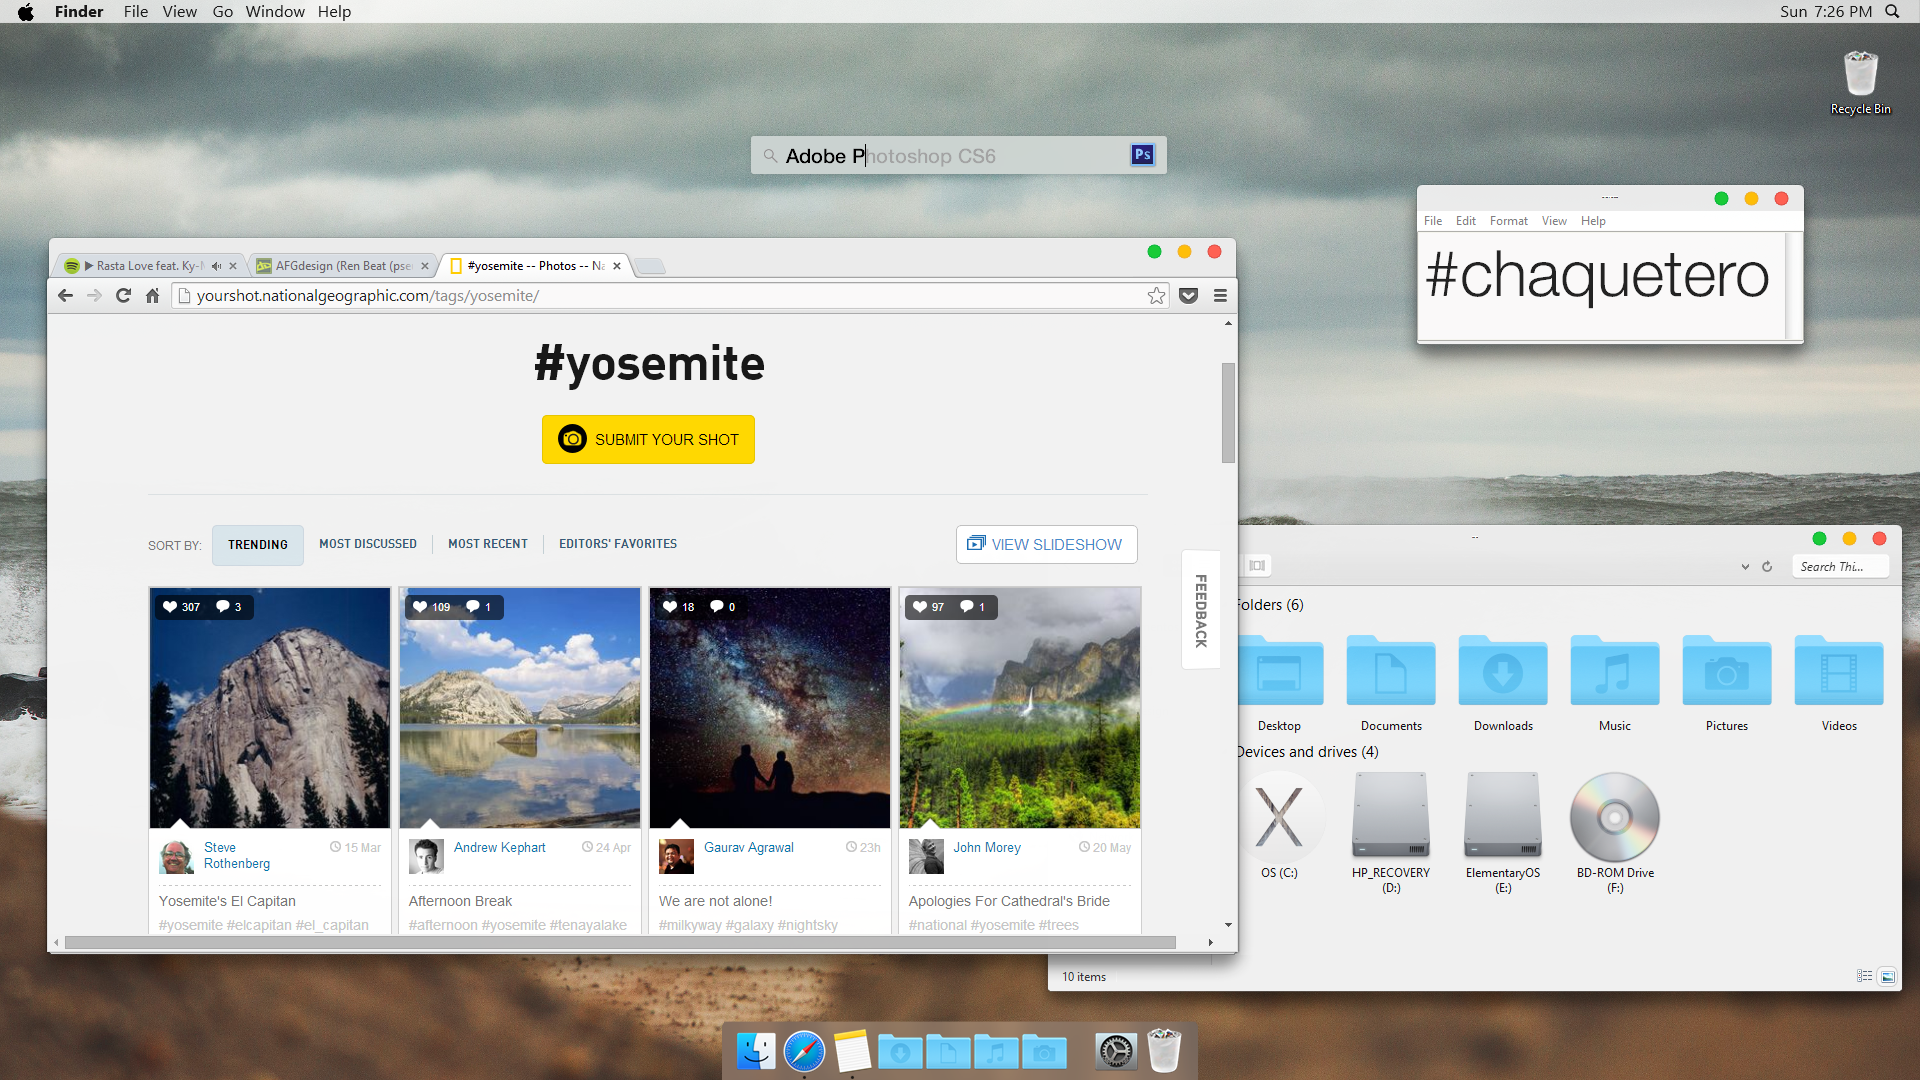 Google chrome themes yosemite -  Win 8 1 Yosemite Screenshot With Notes 8 06 2014 By Afgdesign